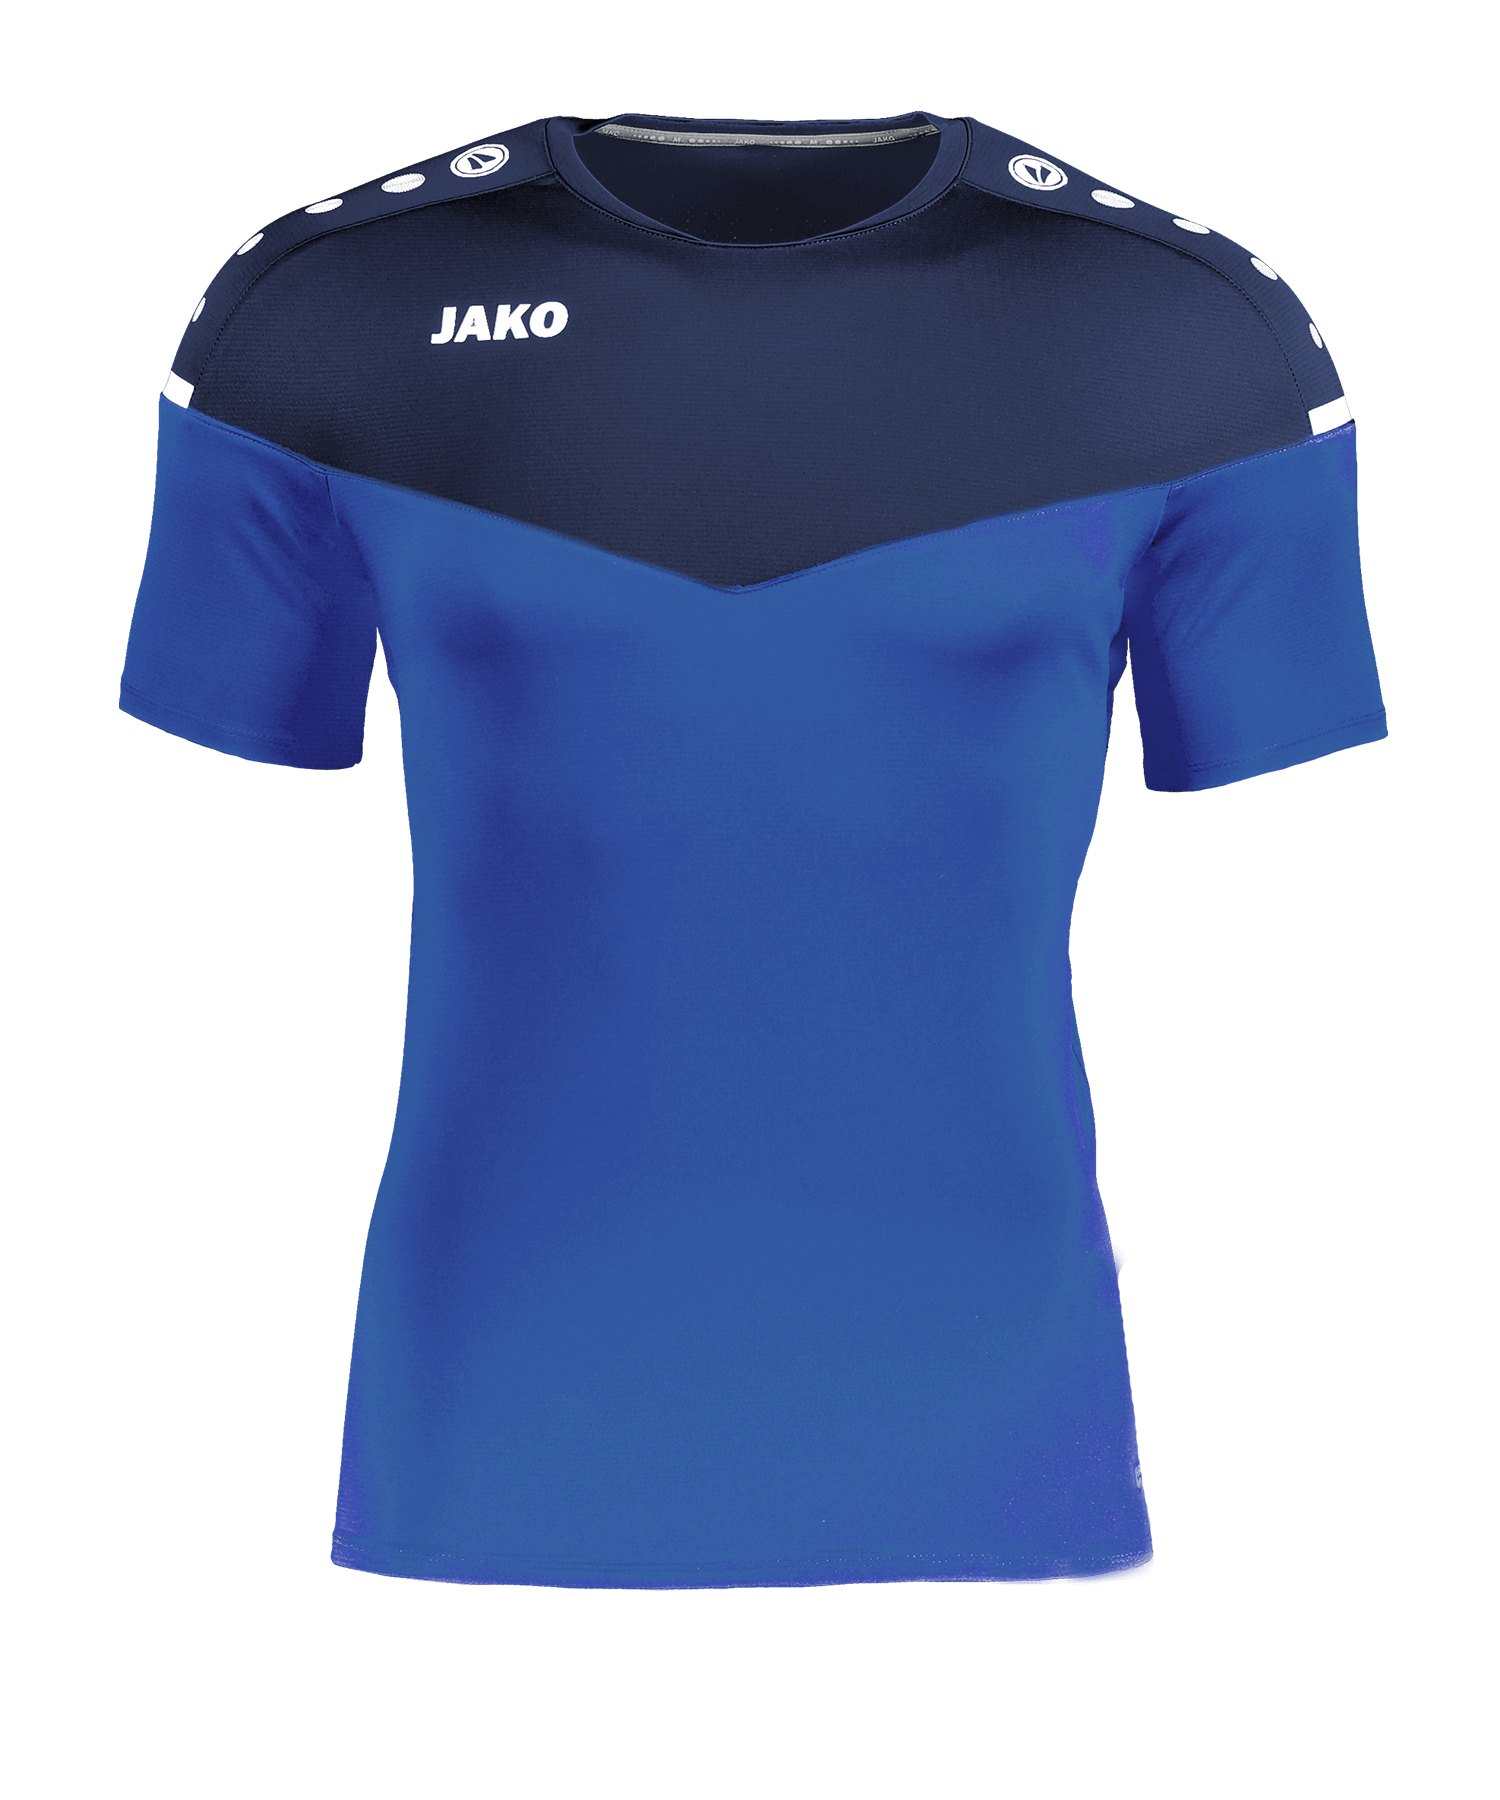 Jako Champ 2.0 T-Shirt Kids Blau F49 - blau